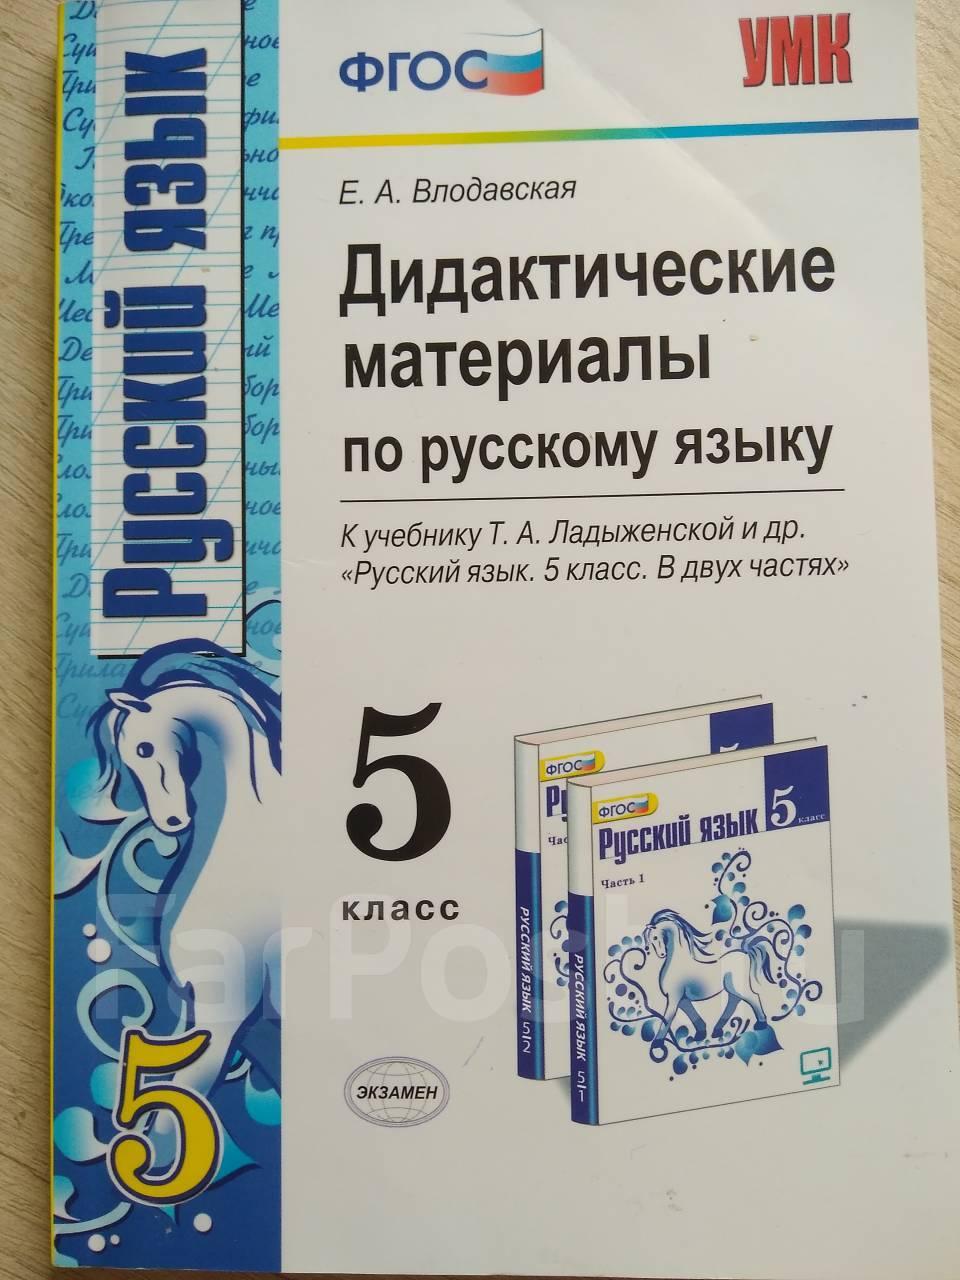 редуслим таблетки для похудения цена в воронеже лнр